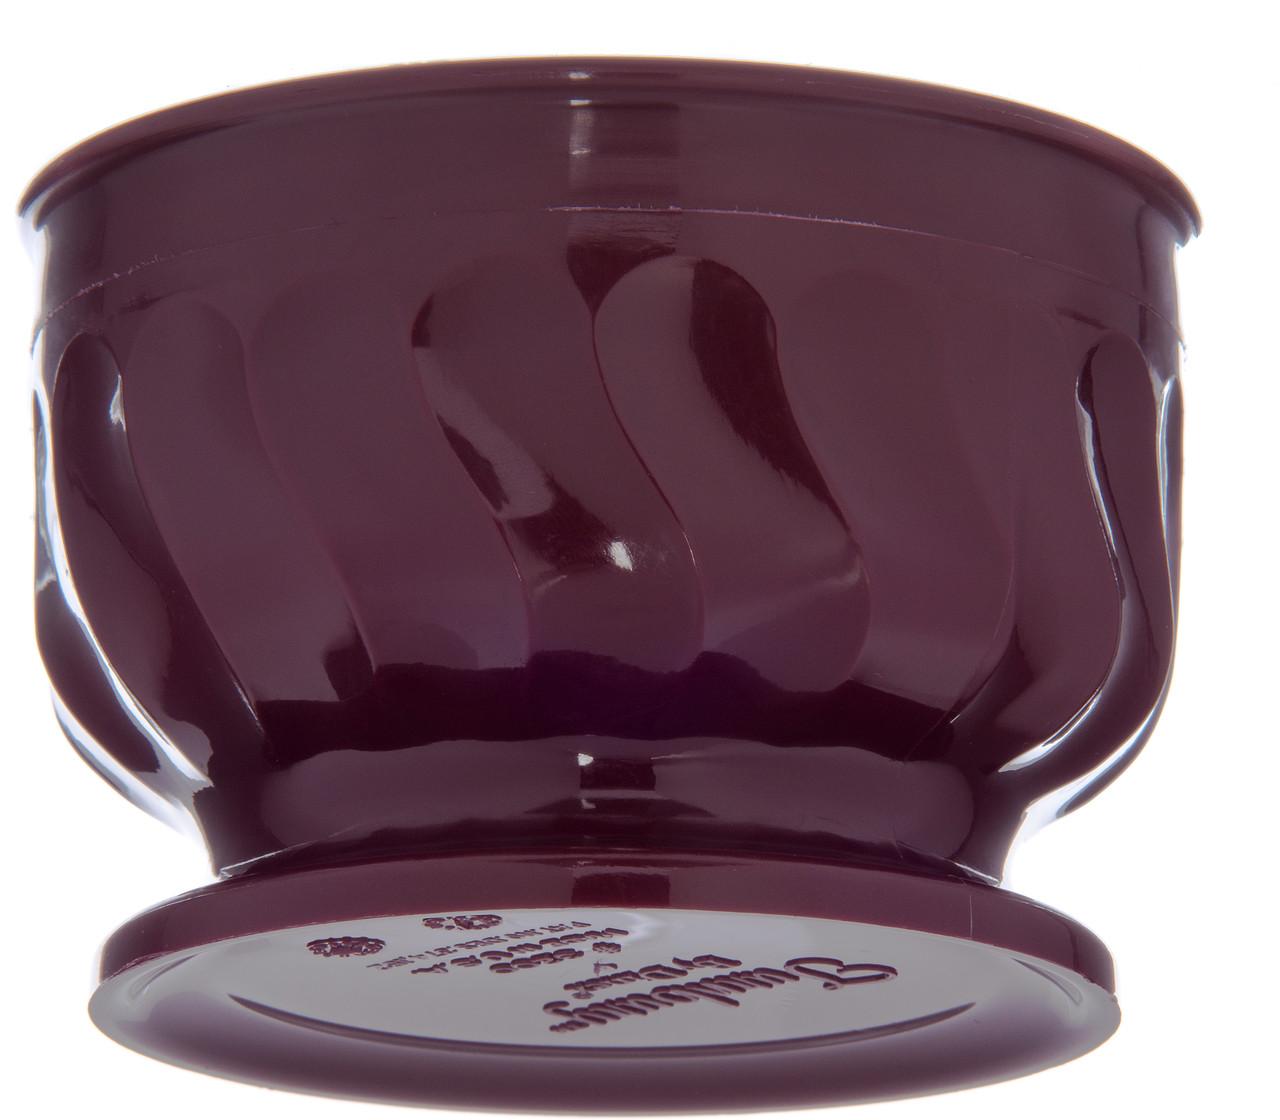 Pedestal Base Bowl, 9 oz., insulated, Turnbury®, cranberry (48 each per case) (3300/20)